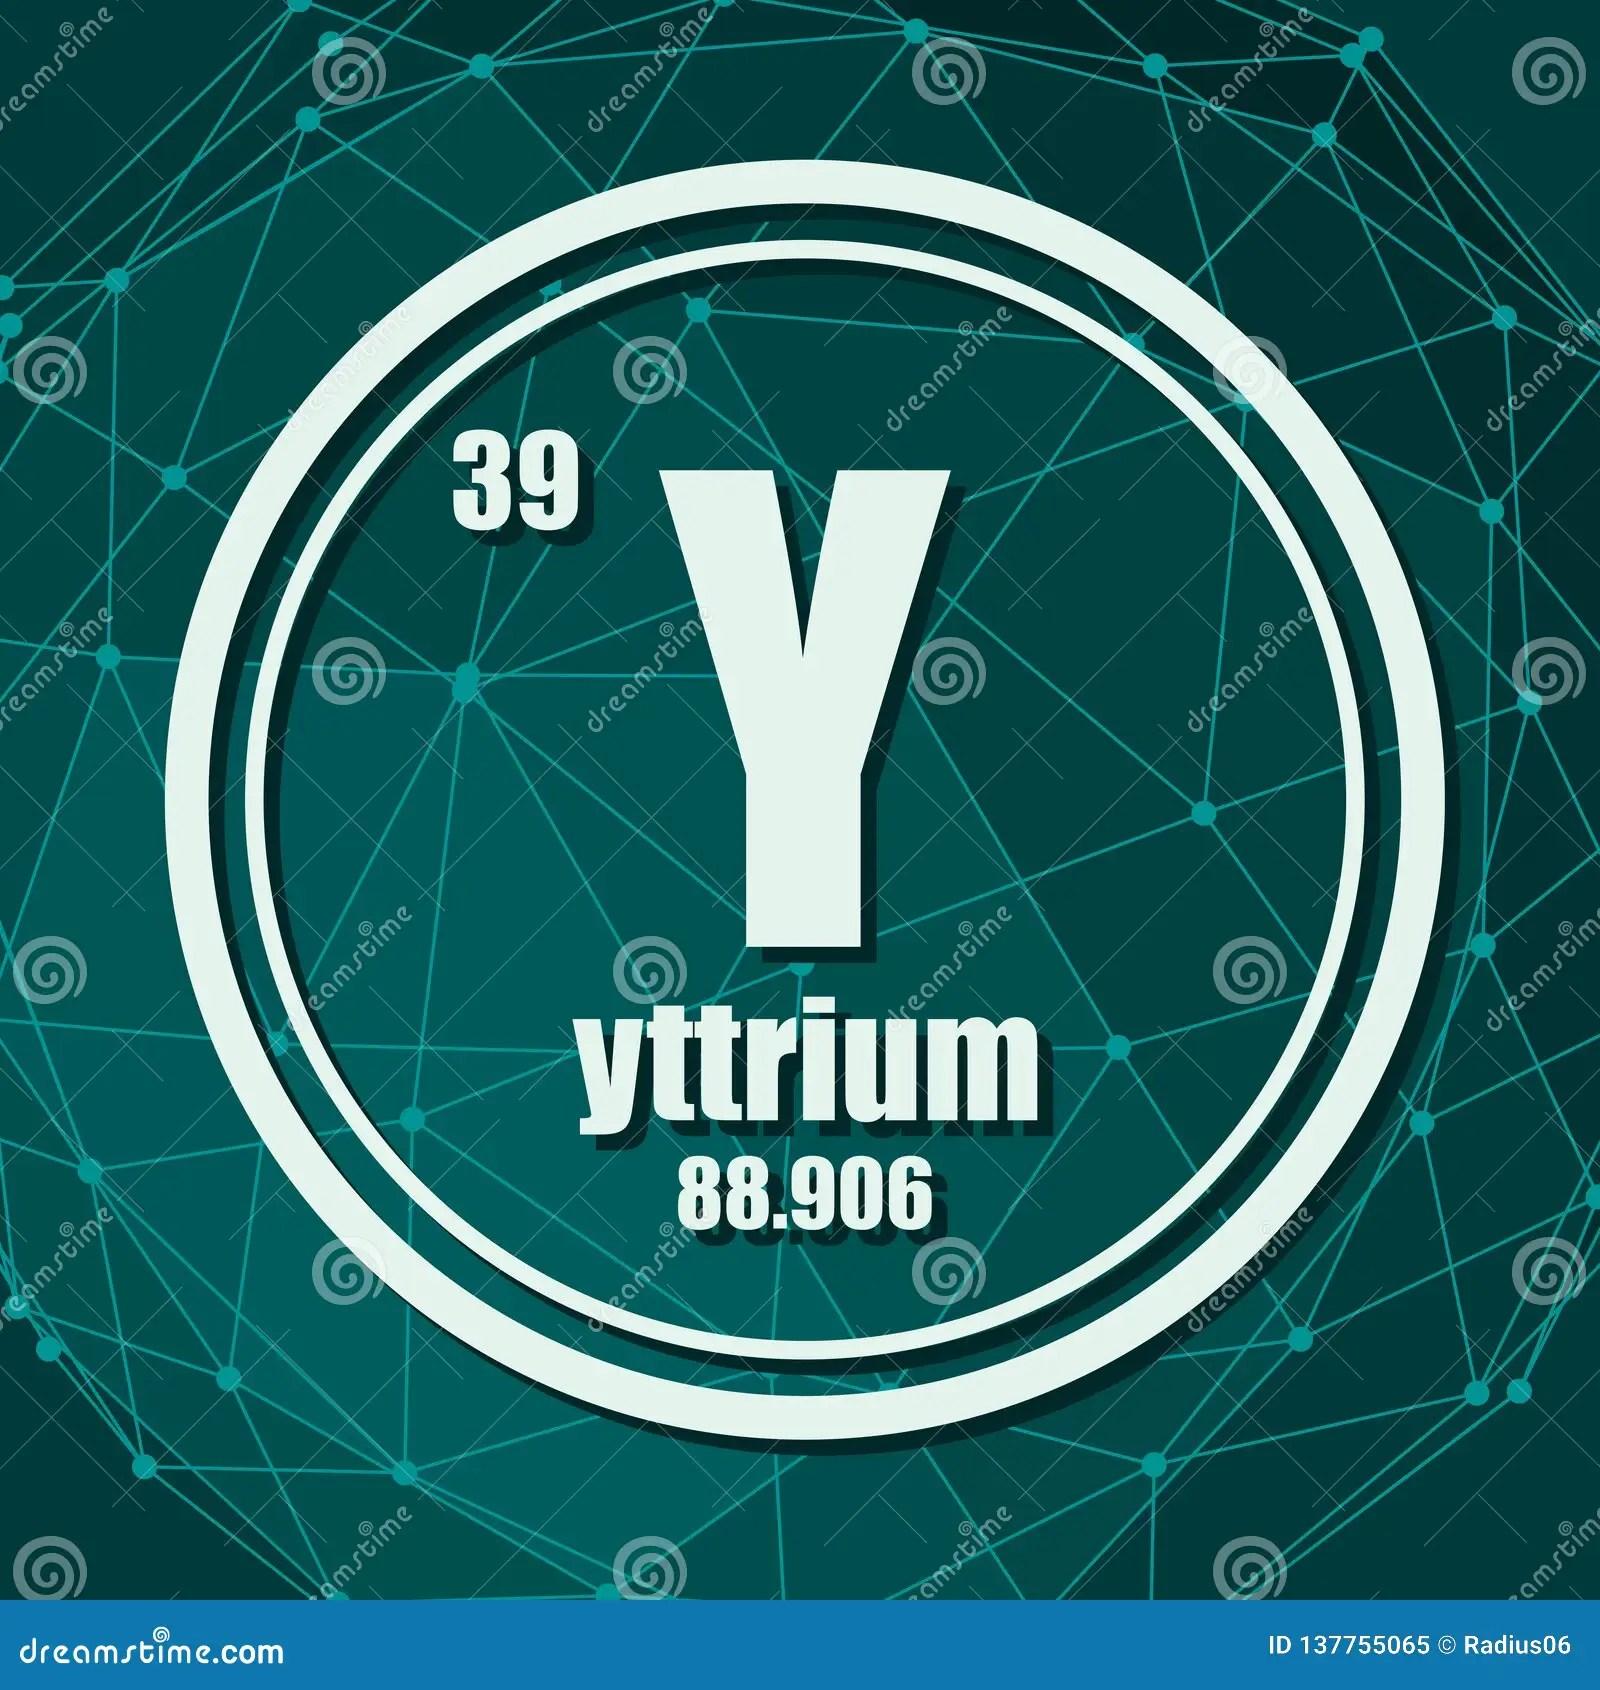 hight resolution of yttrium chemical element stock vector illustration of moleculardot diagram of yttrium 20